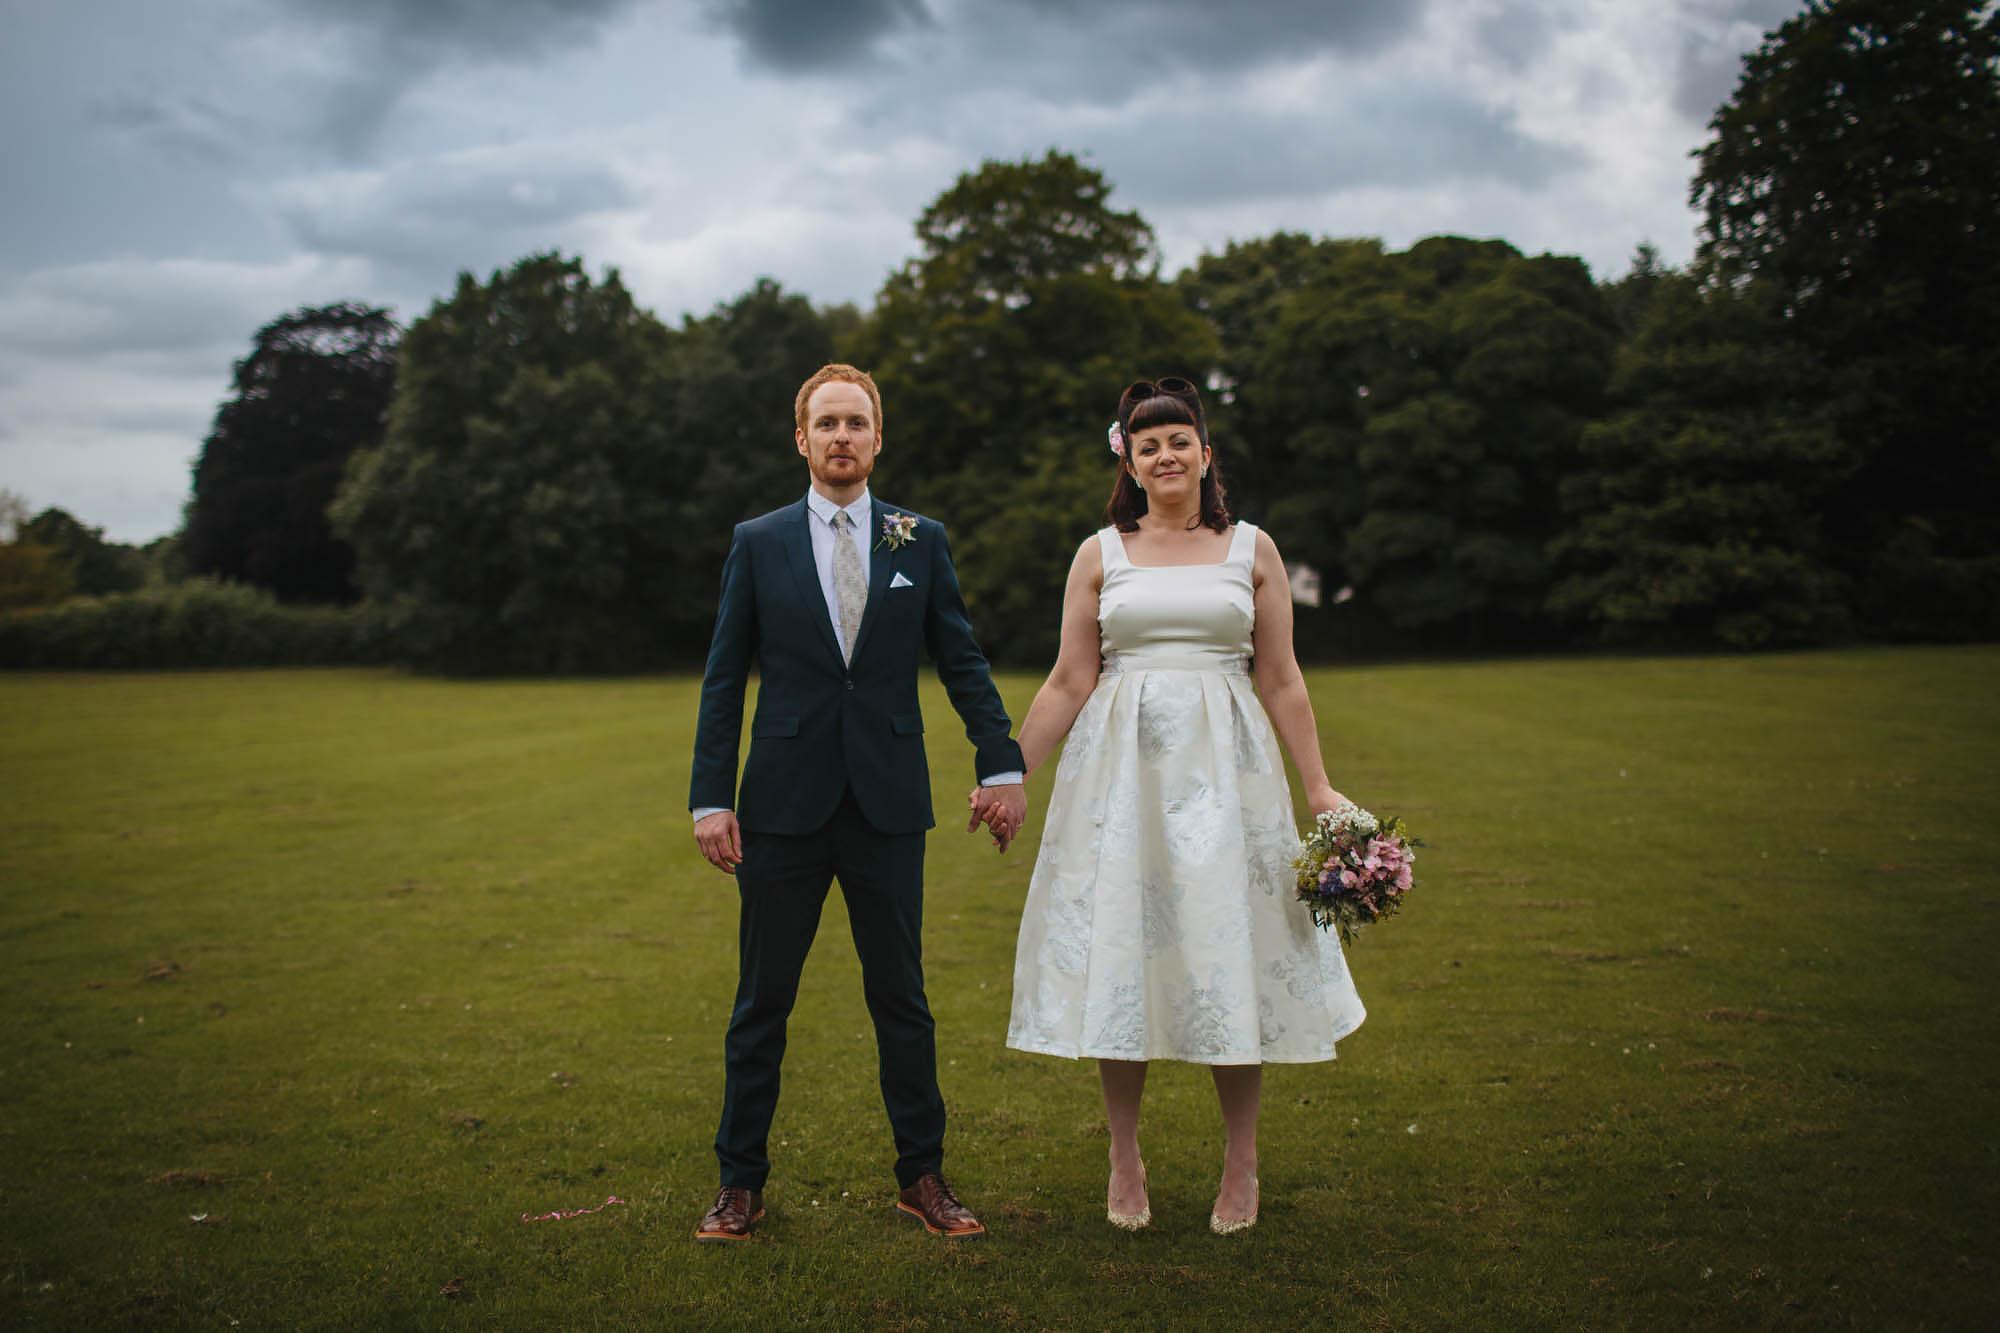 Leeds Yorkshire Wedding Photographer Portrait Grass Trees